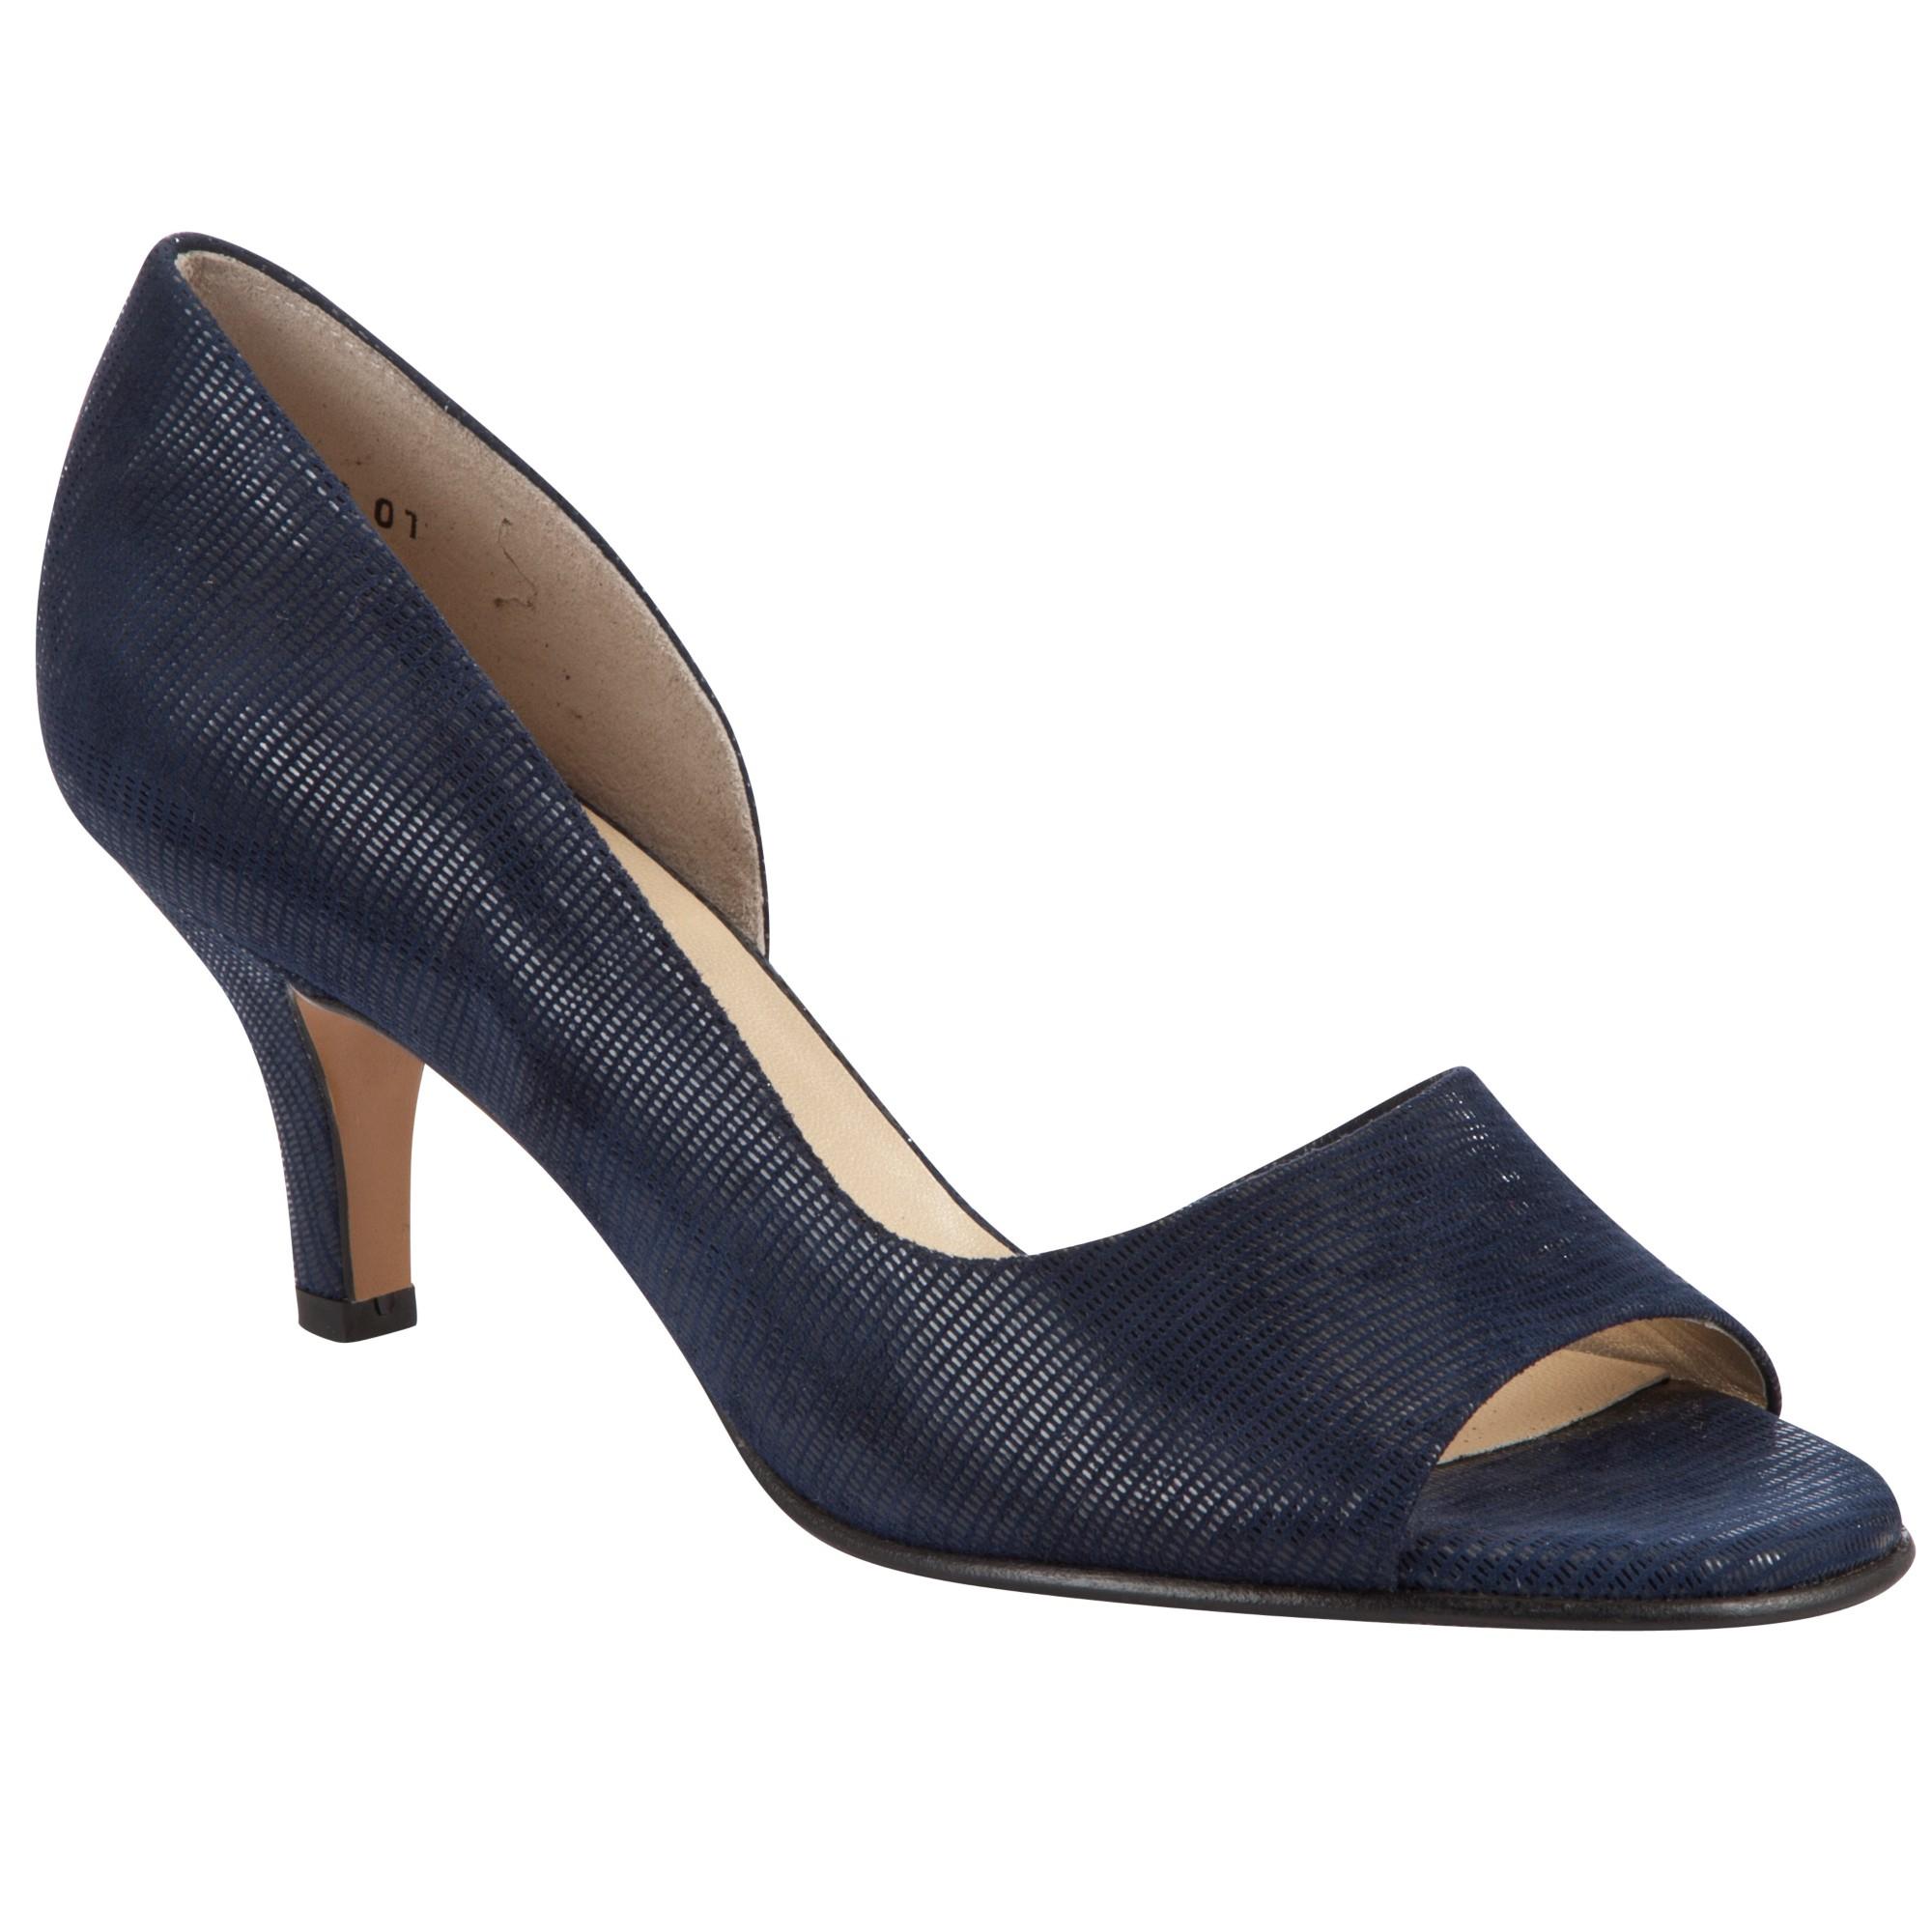 sports shoes e6380 571ed Peter Kaiser Leather Jamala Peep Toe Heeled Sandals in Navy ...